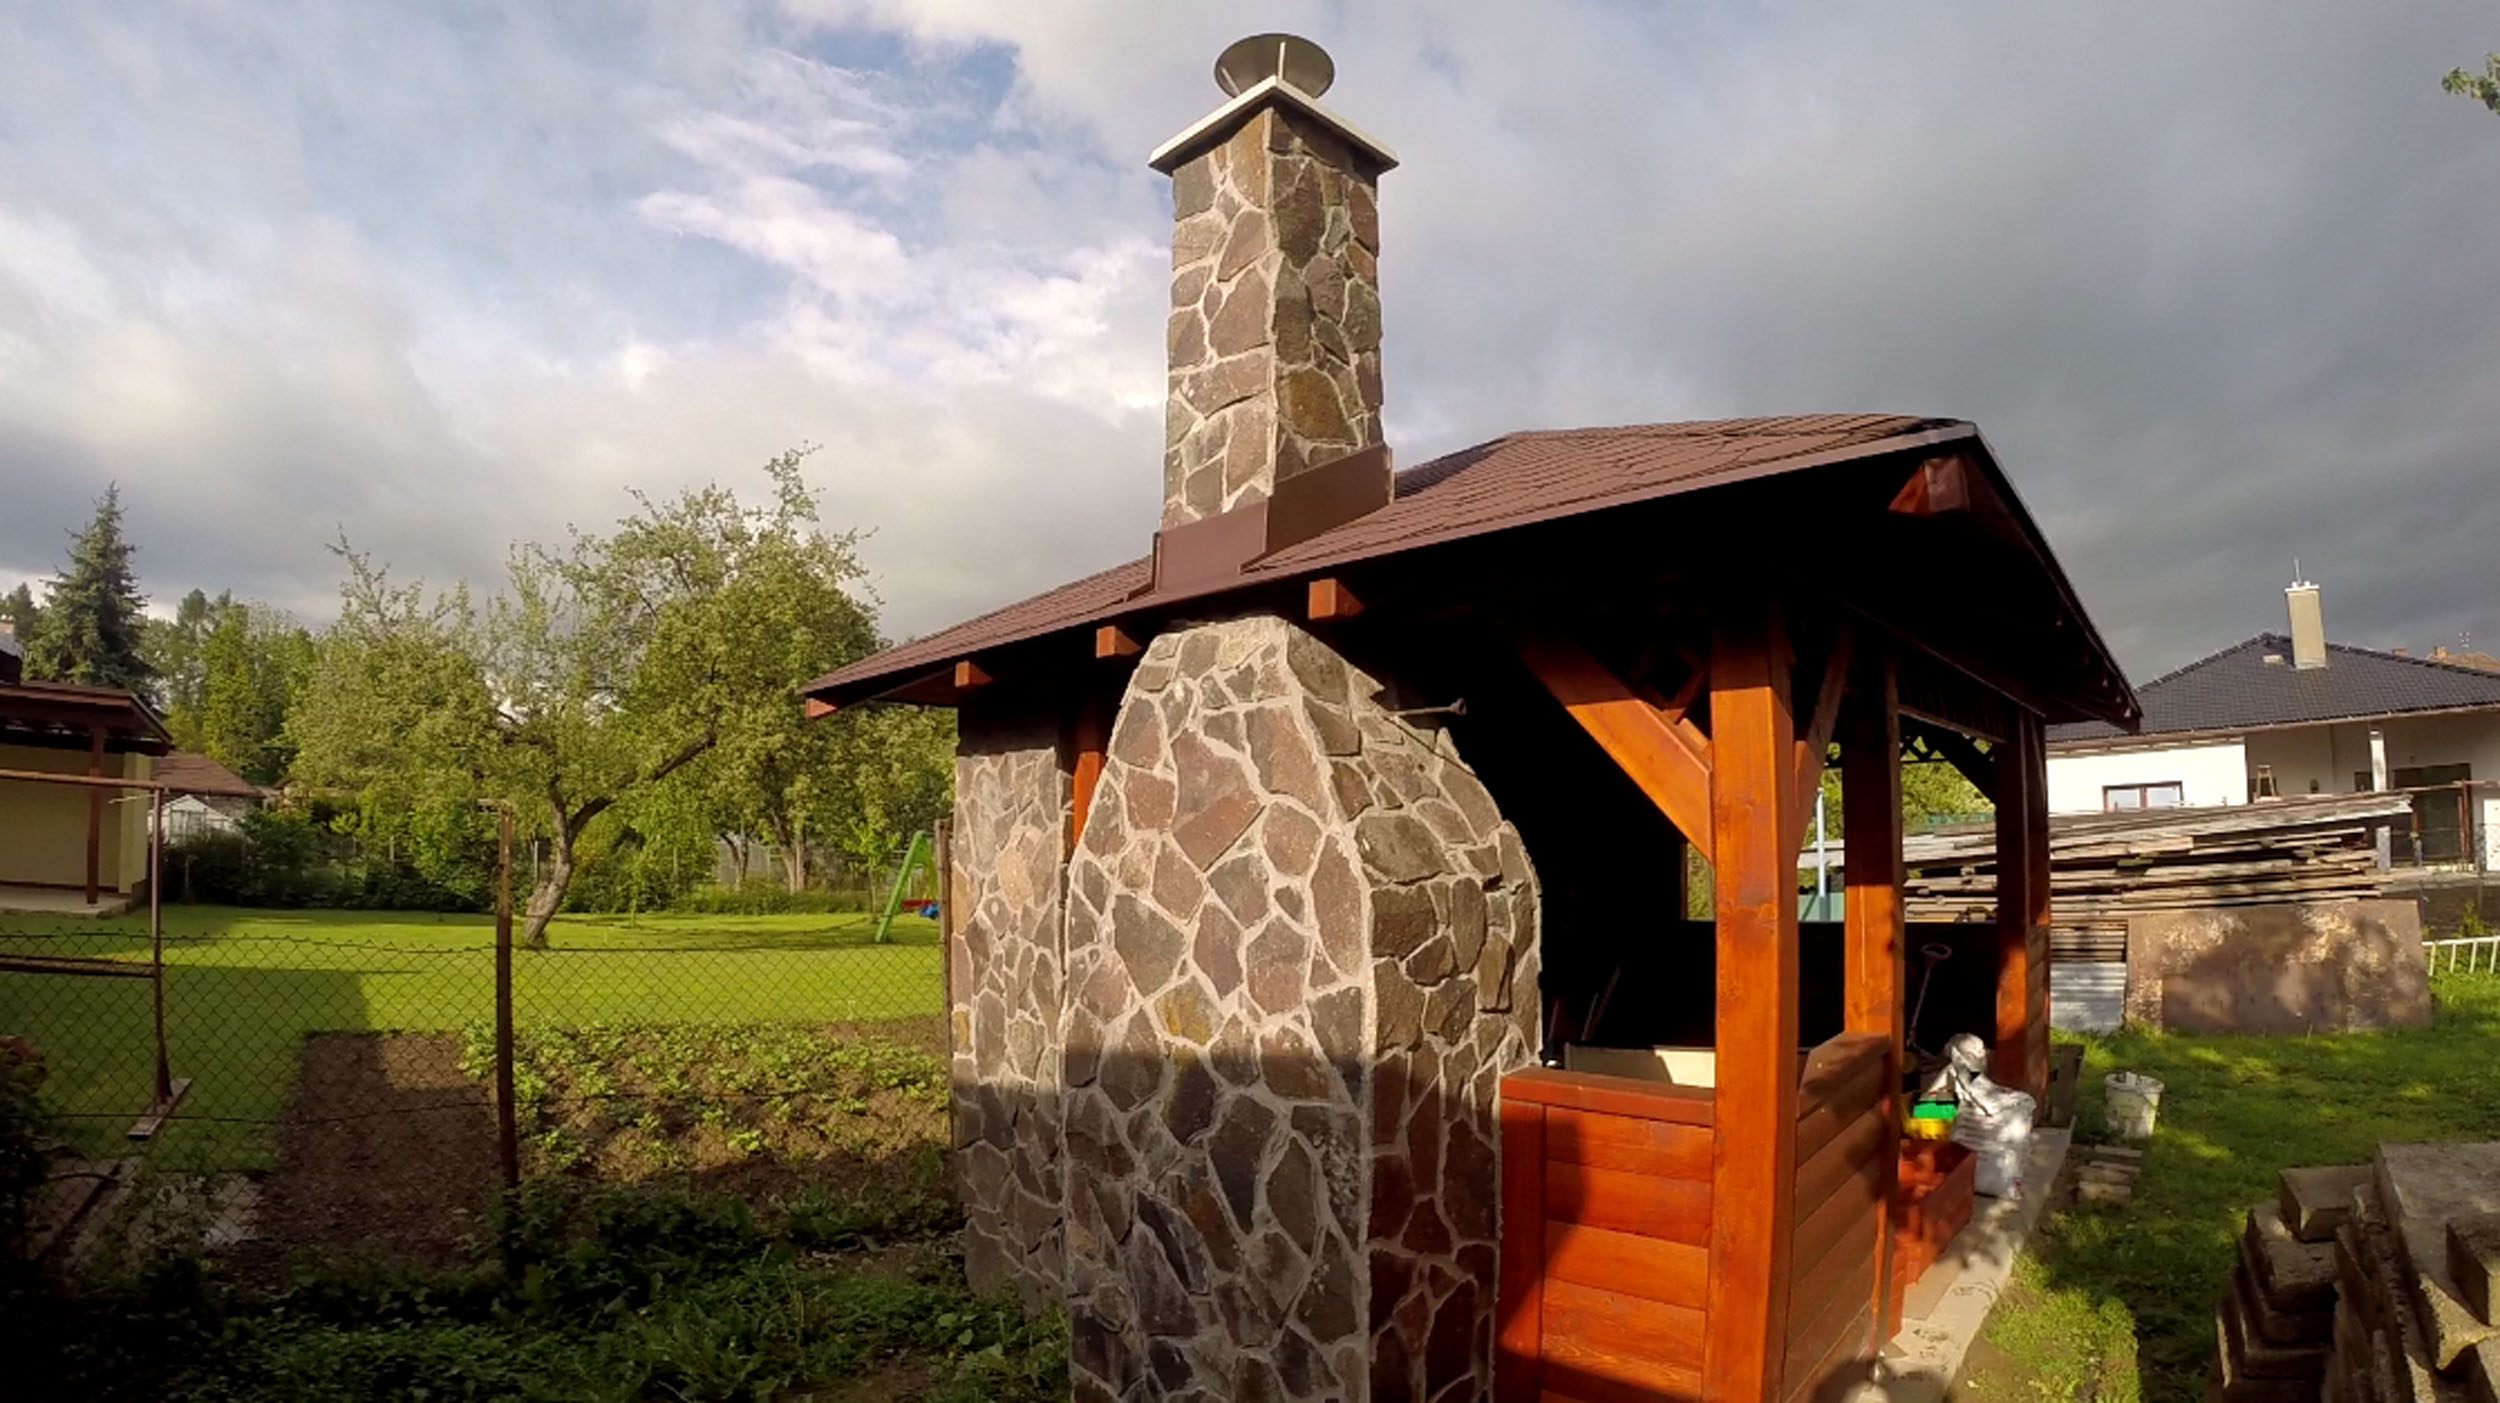 Téma - Krb do altánku - stavba murovaného krbu s kam. obkladom • www ...